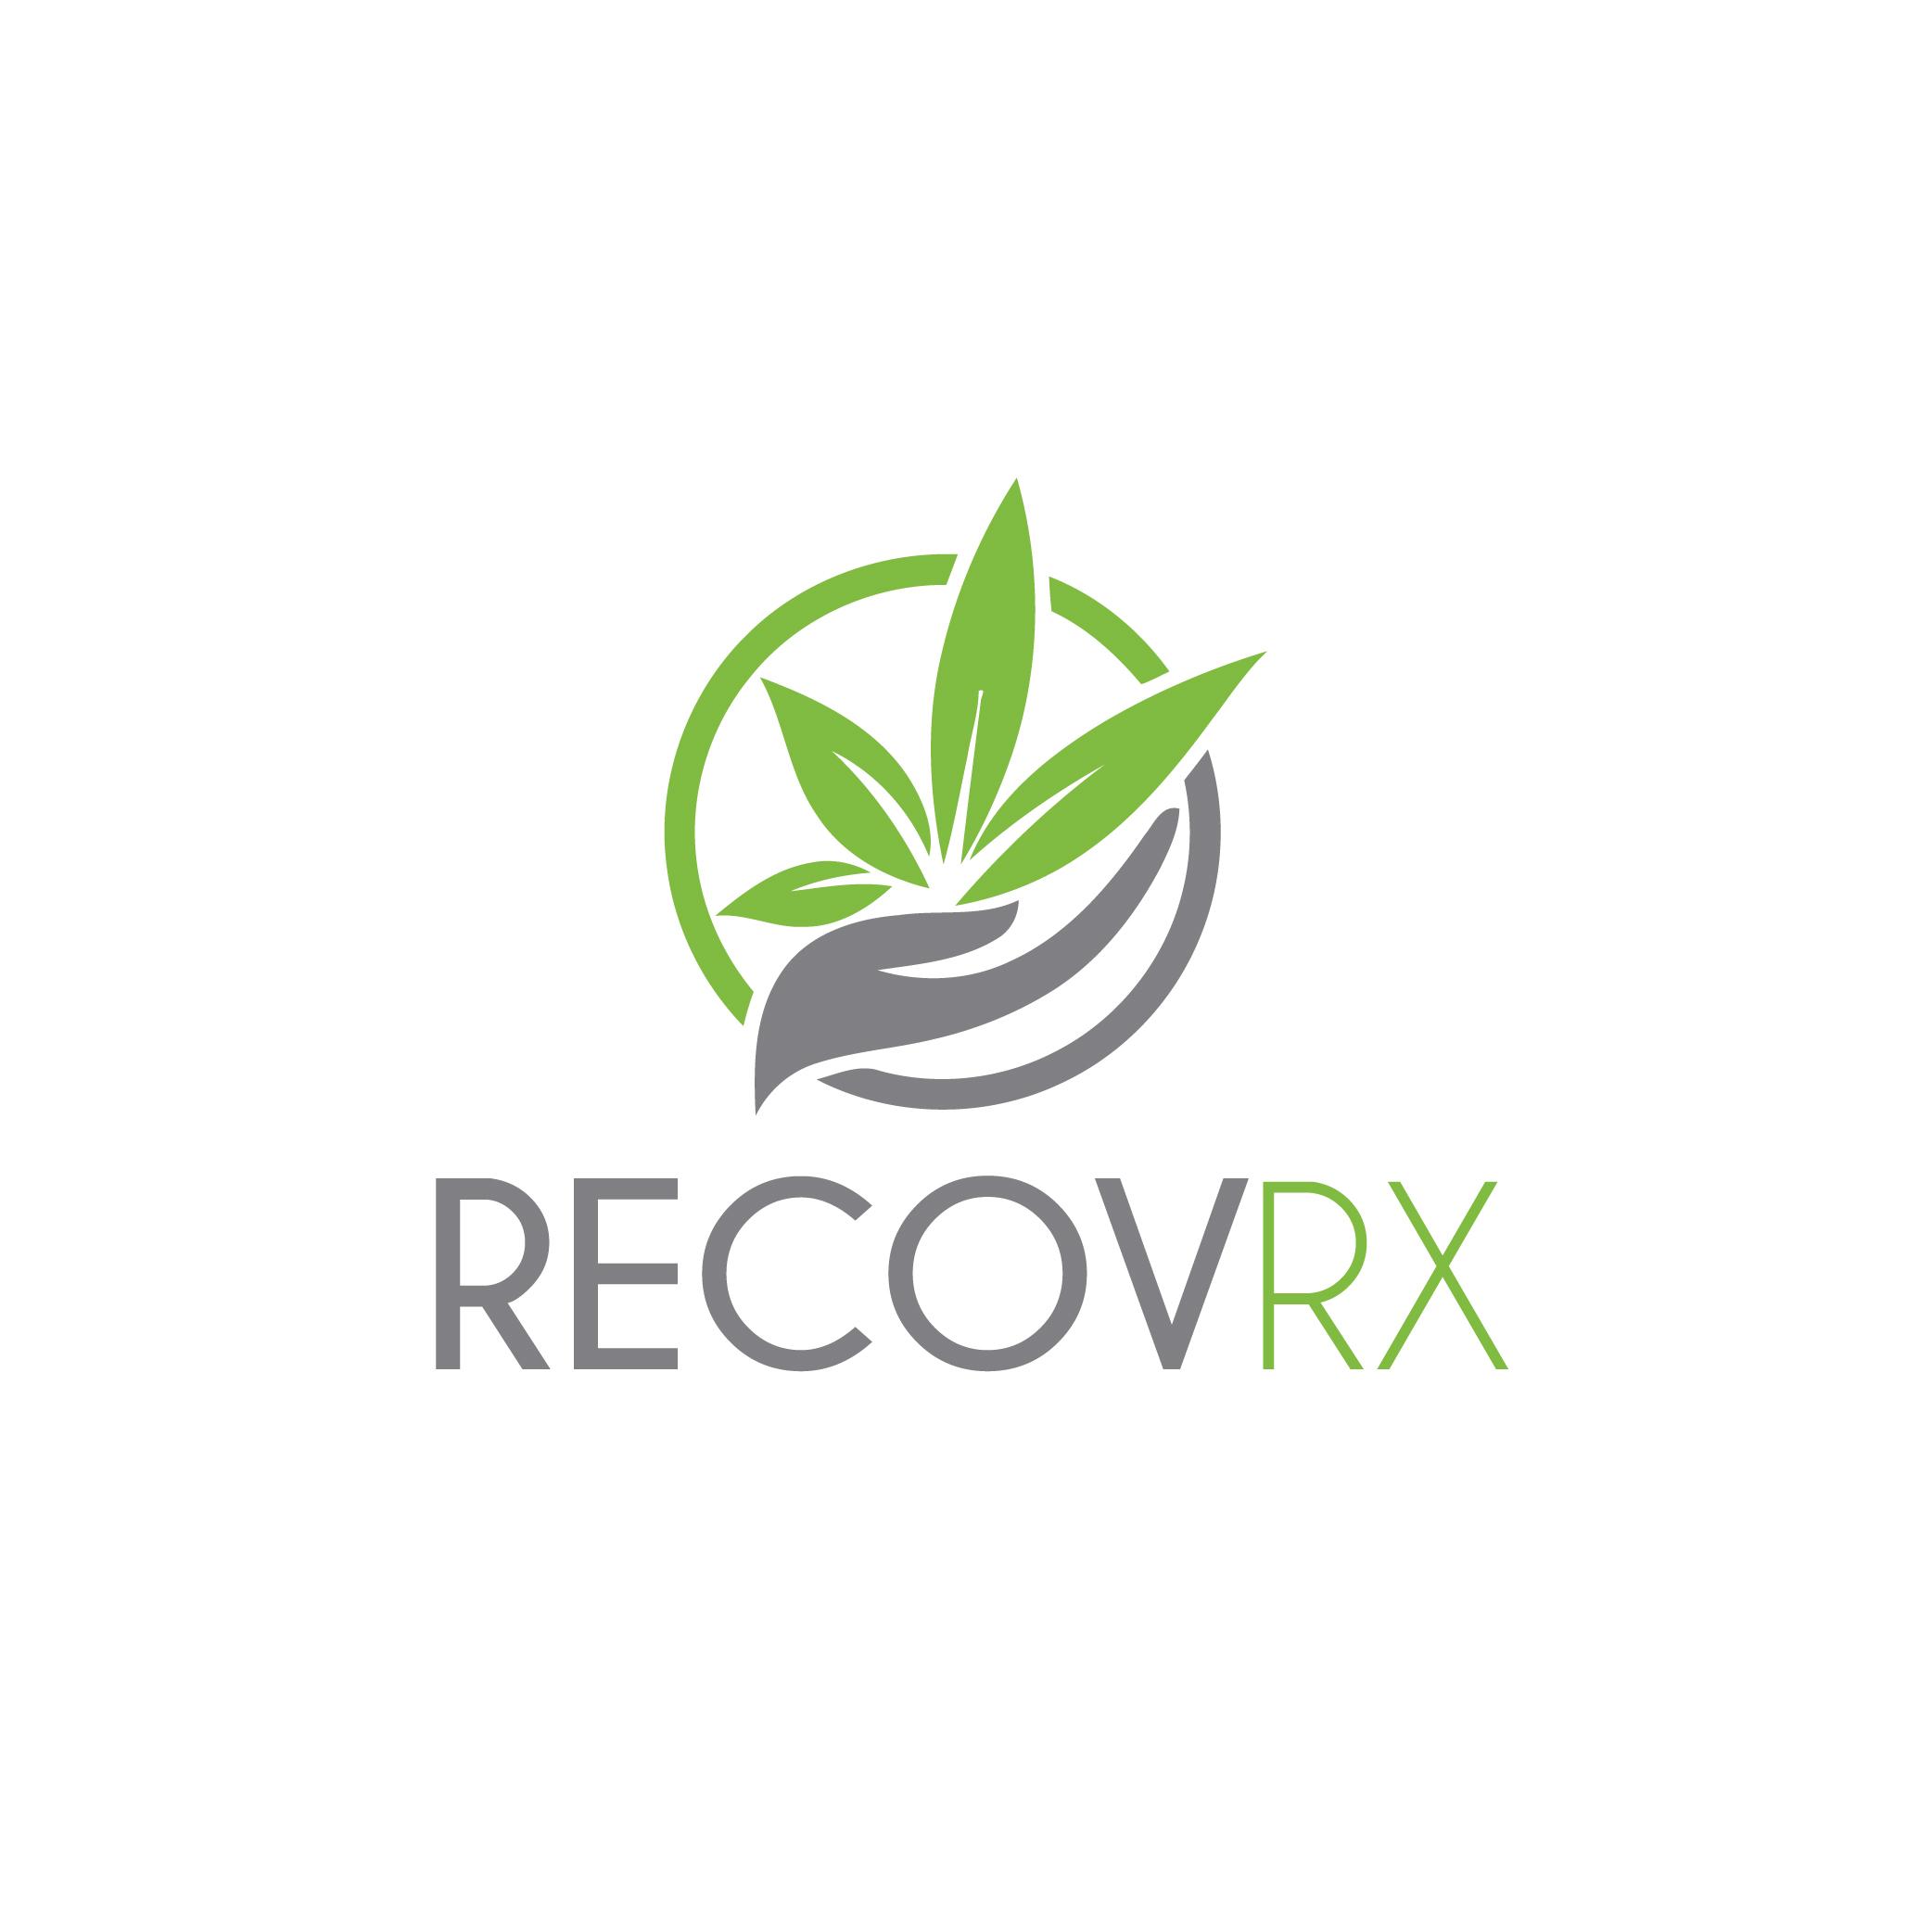 RECOVRX